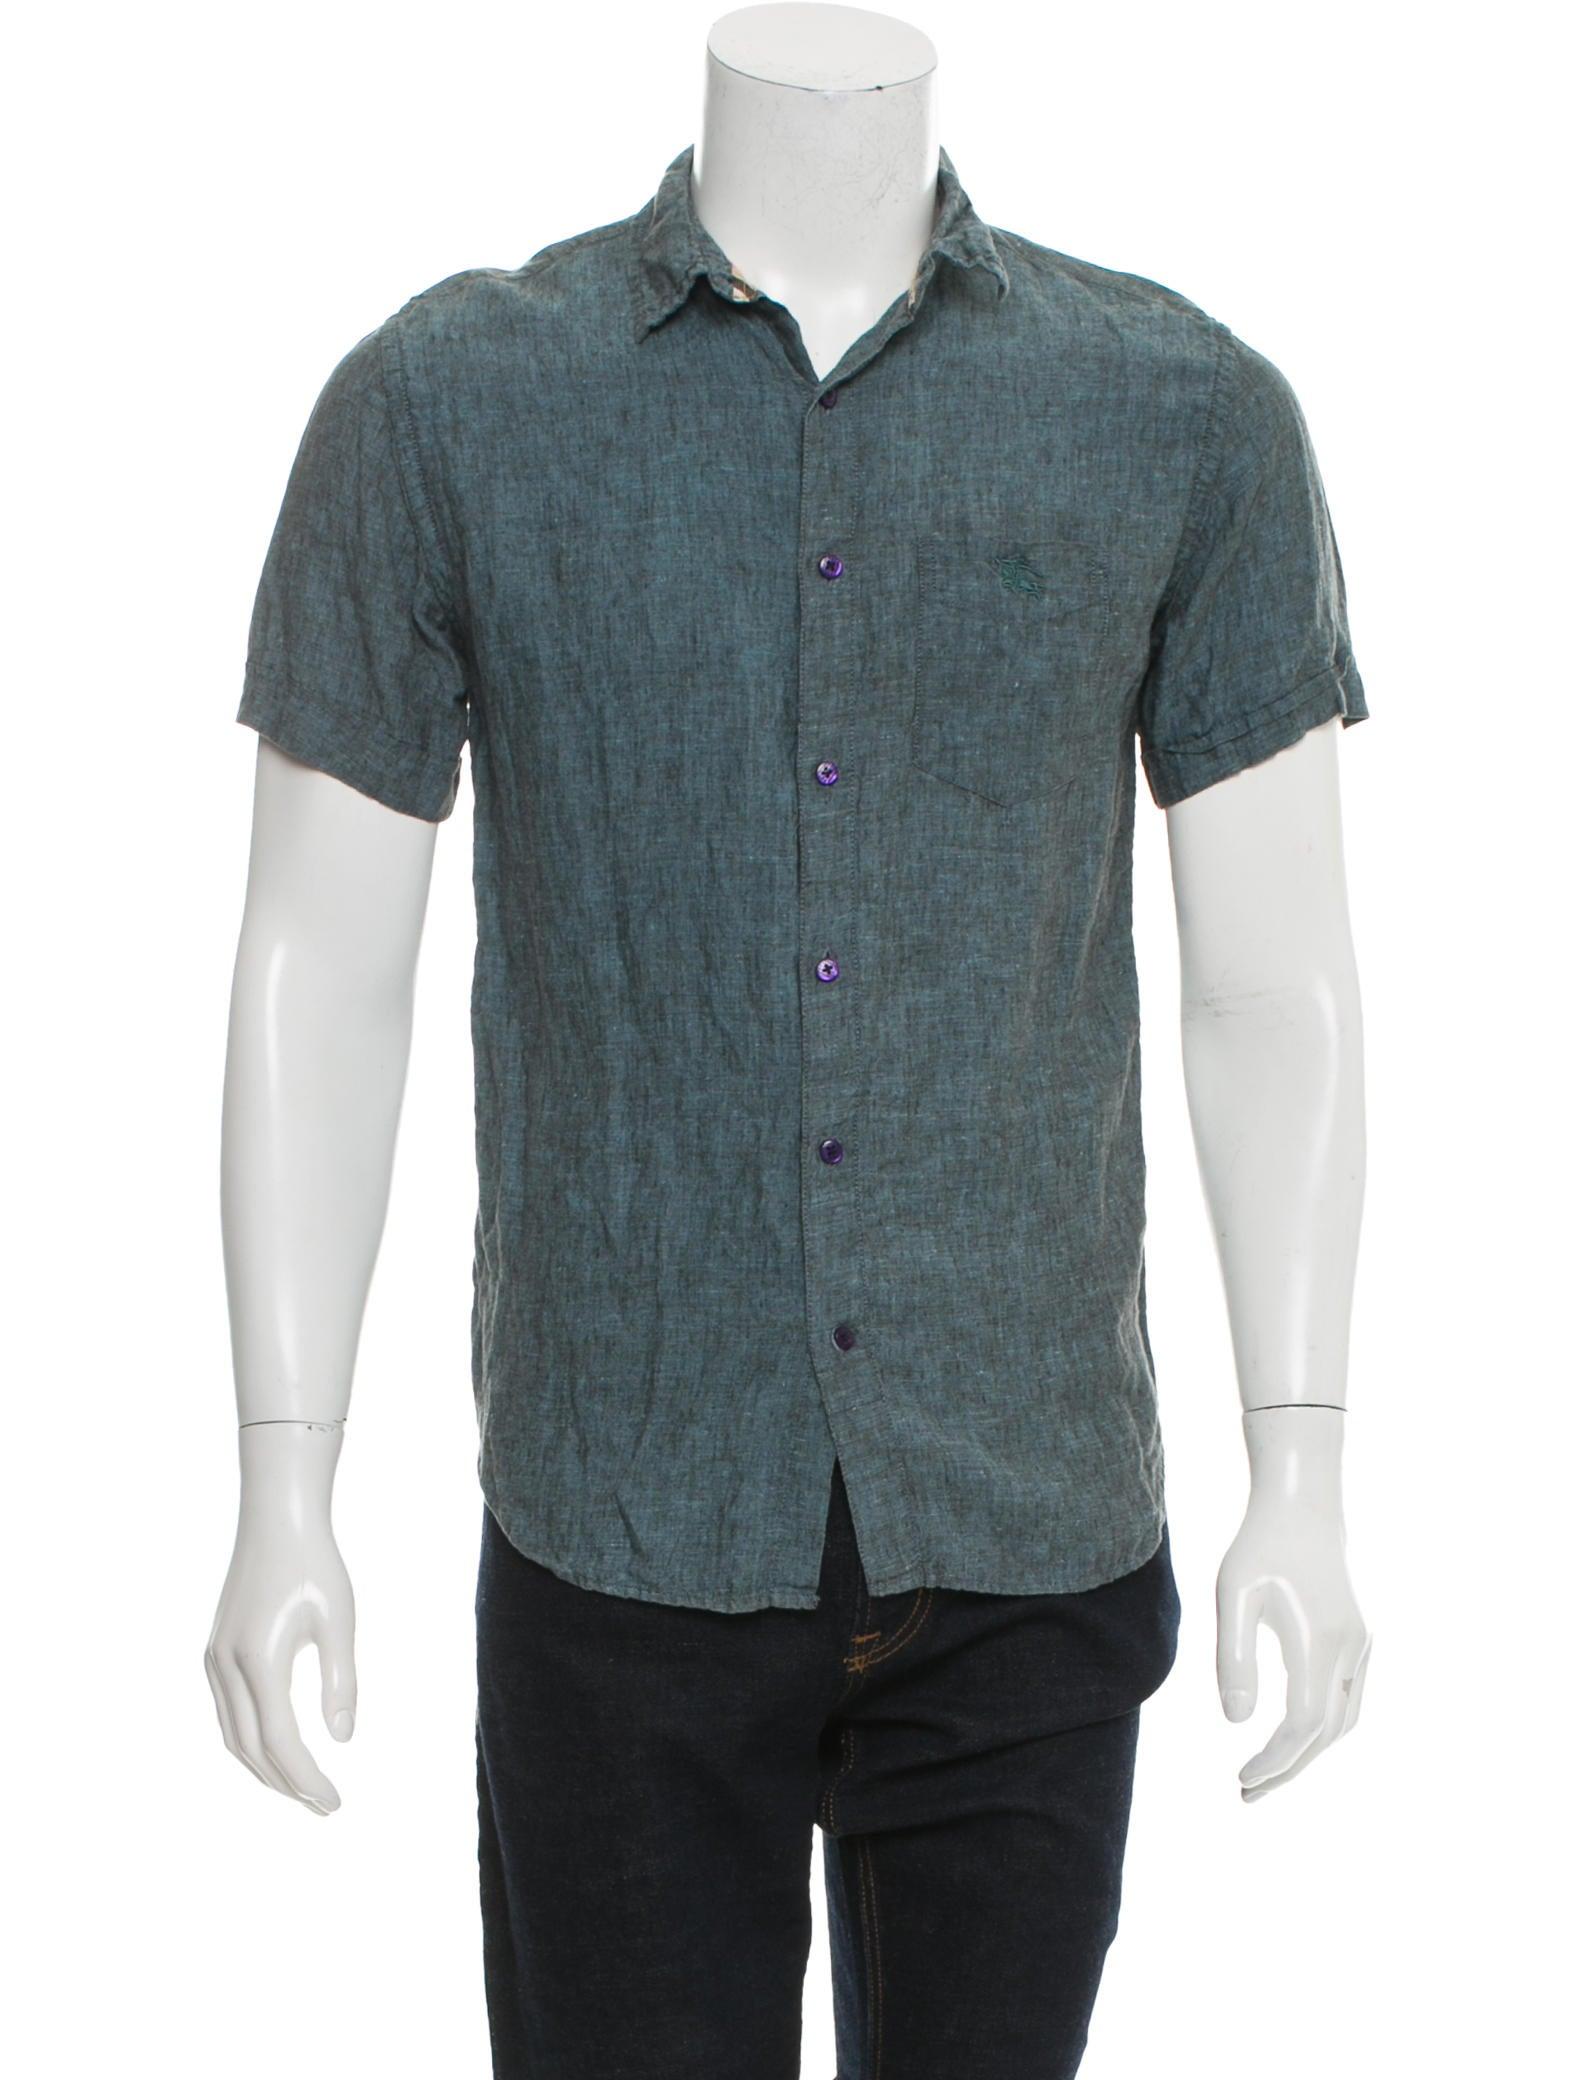 Burberry Brit Short Sleeve Button Up Shirt Clothing